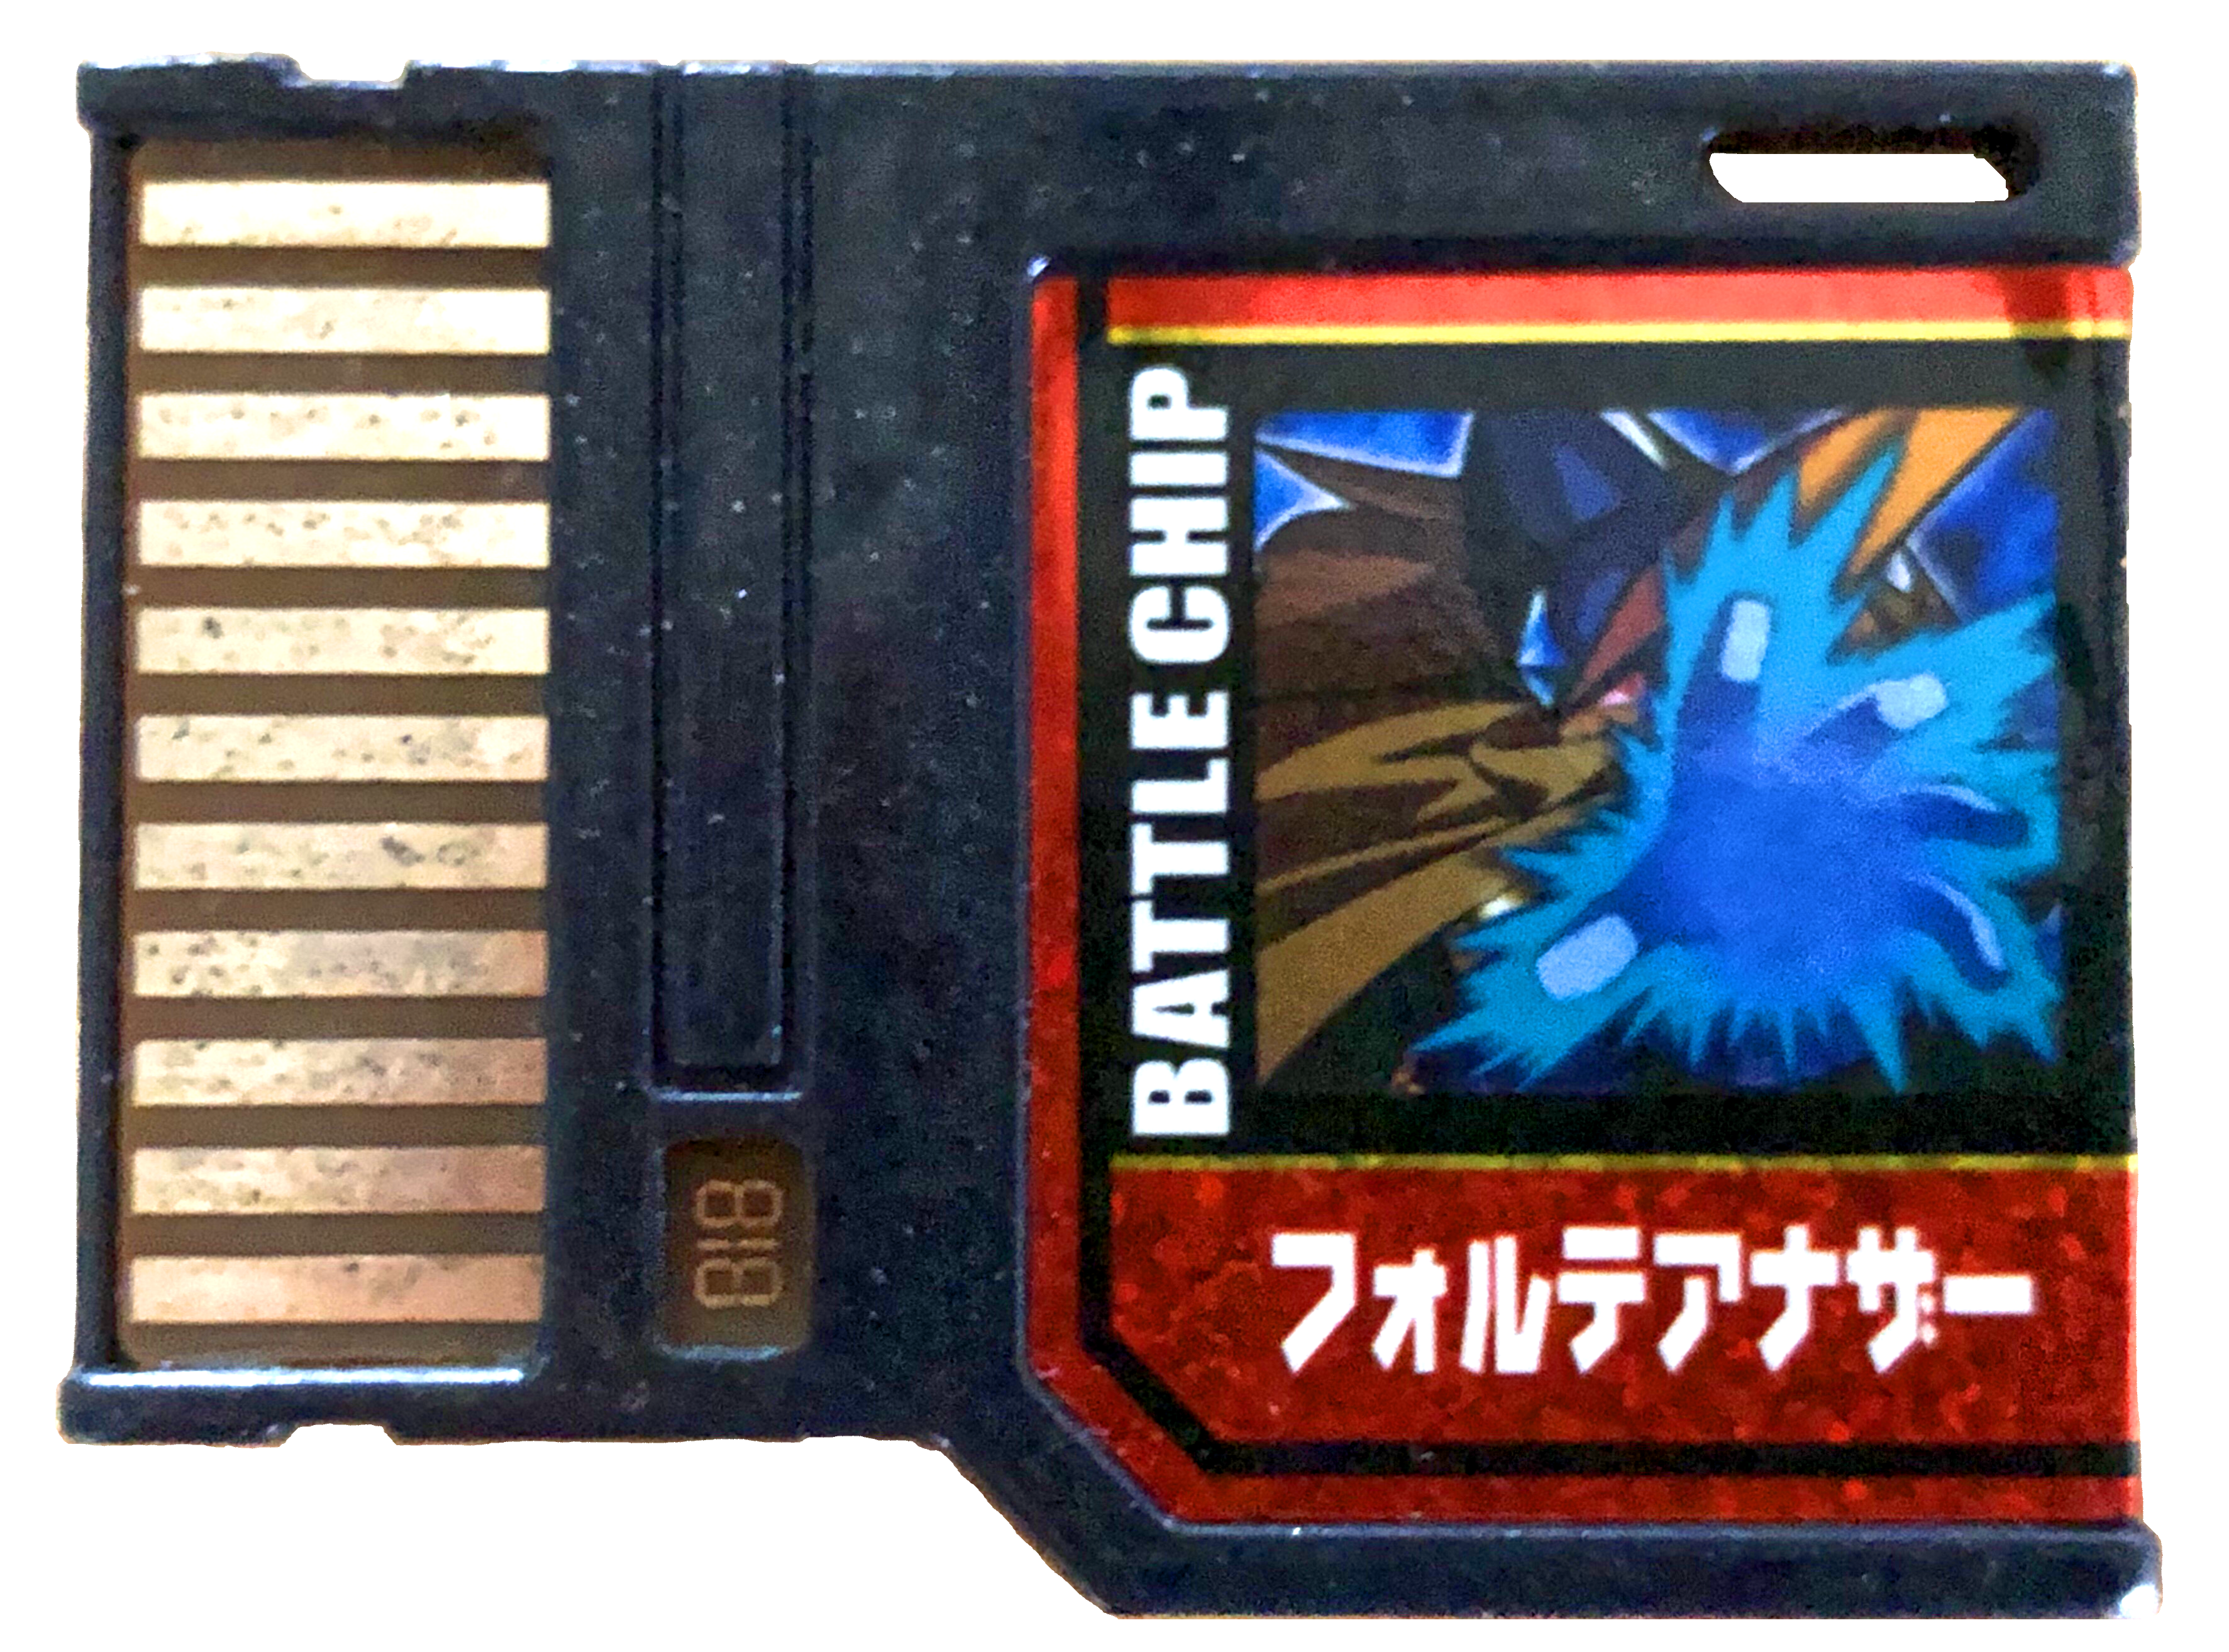 File:BattleChip818.png